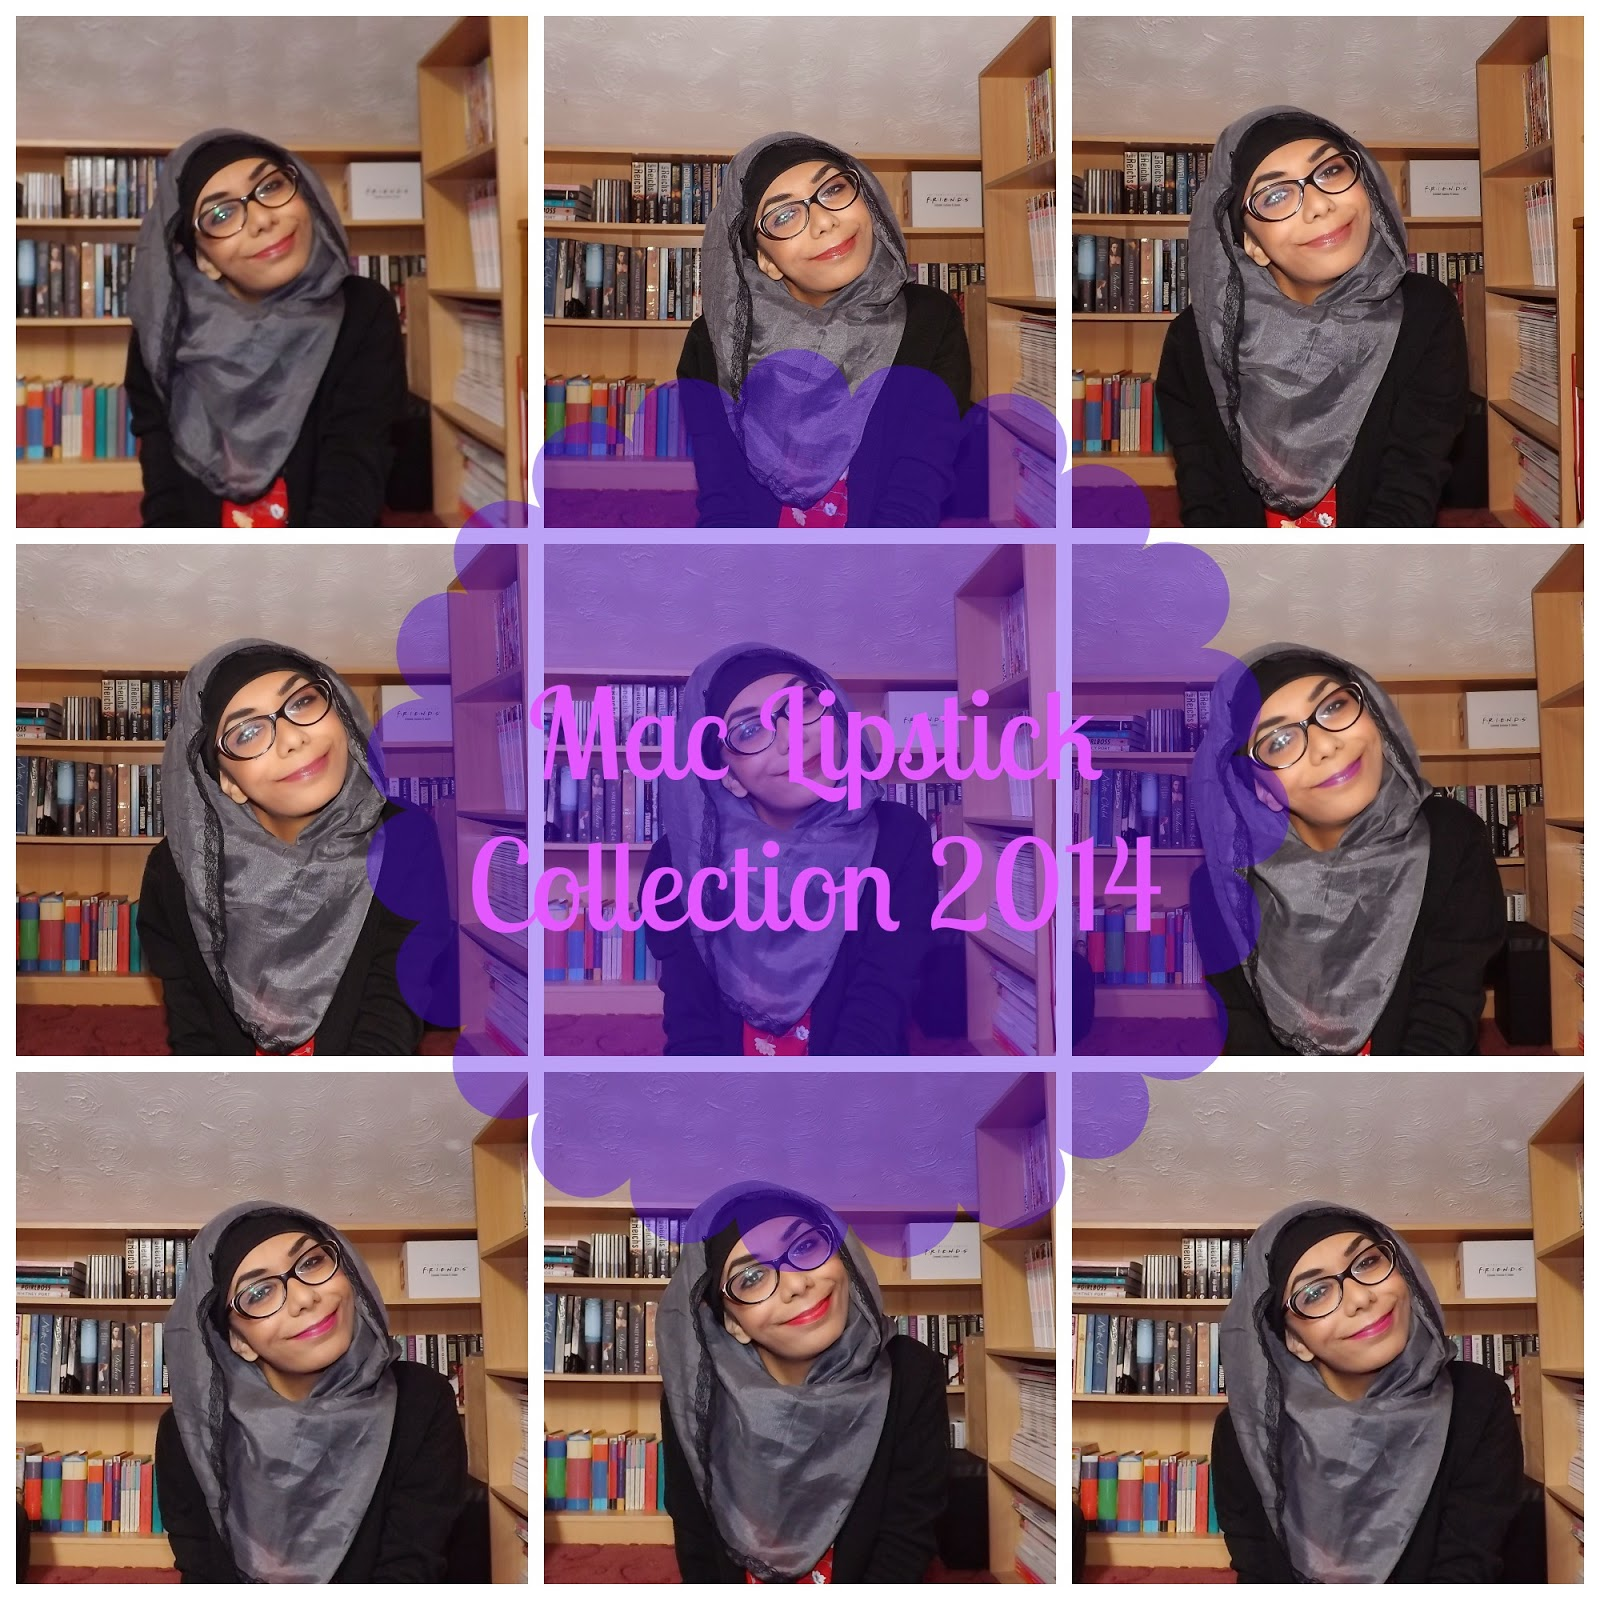 MAC-Lipstick-Collection-2014-Thumbnail1